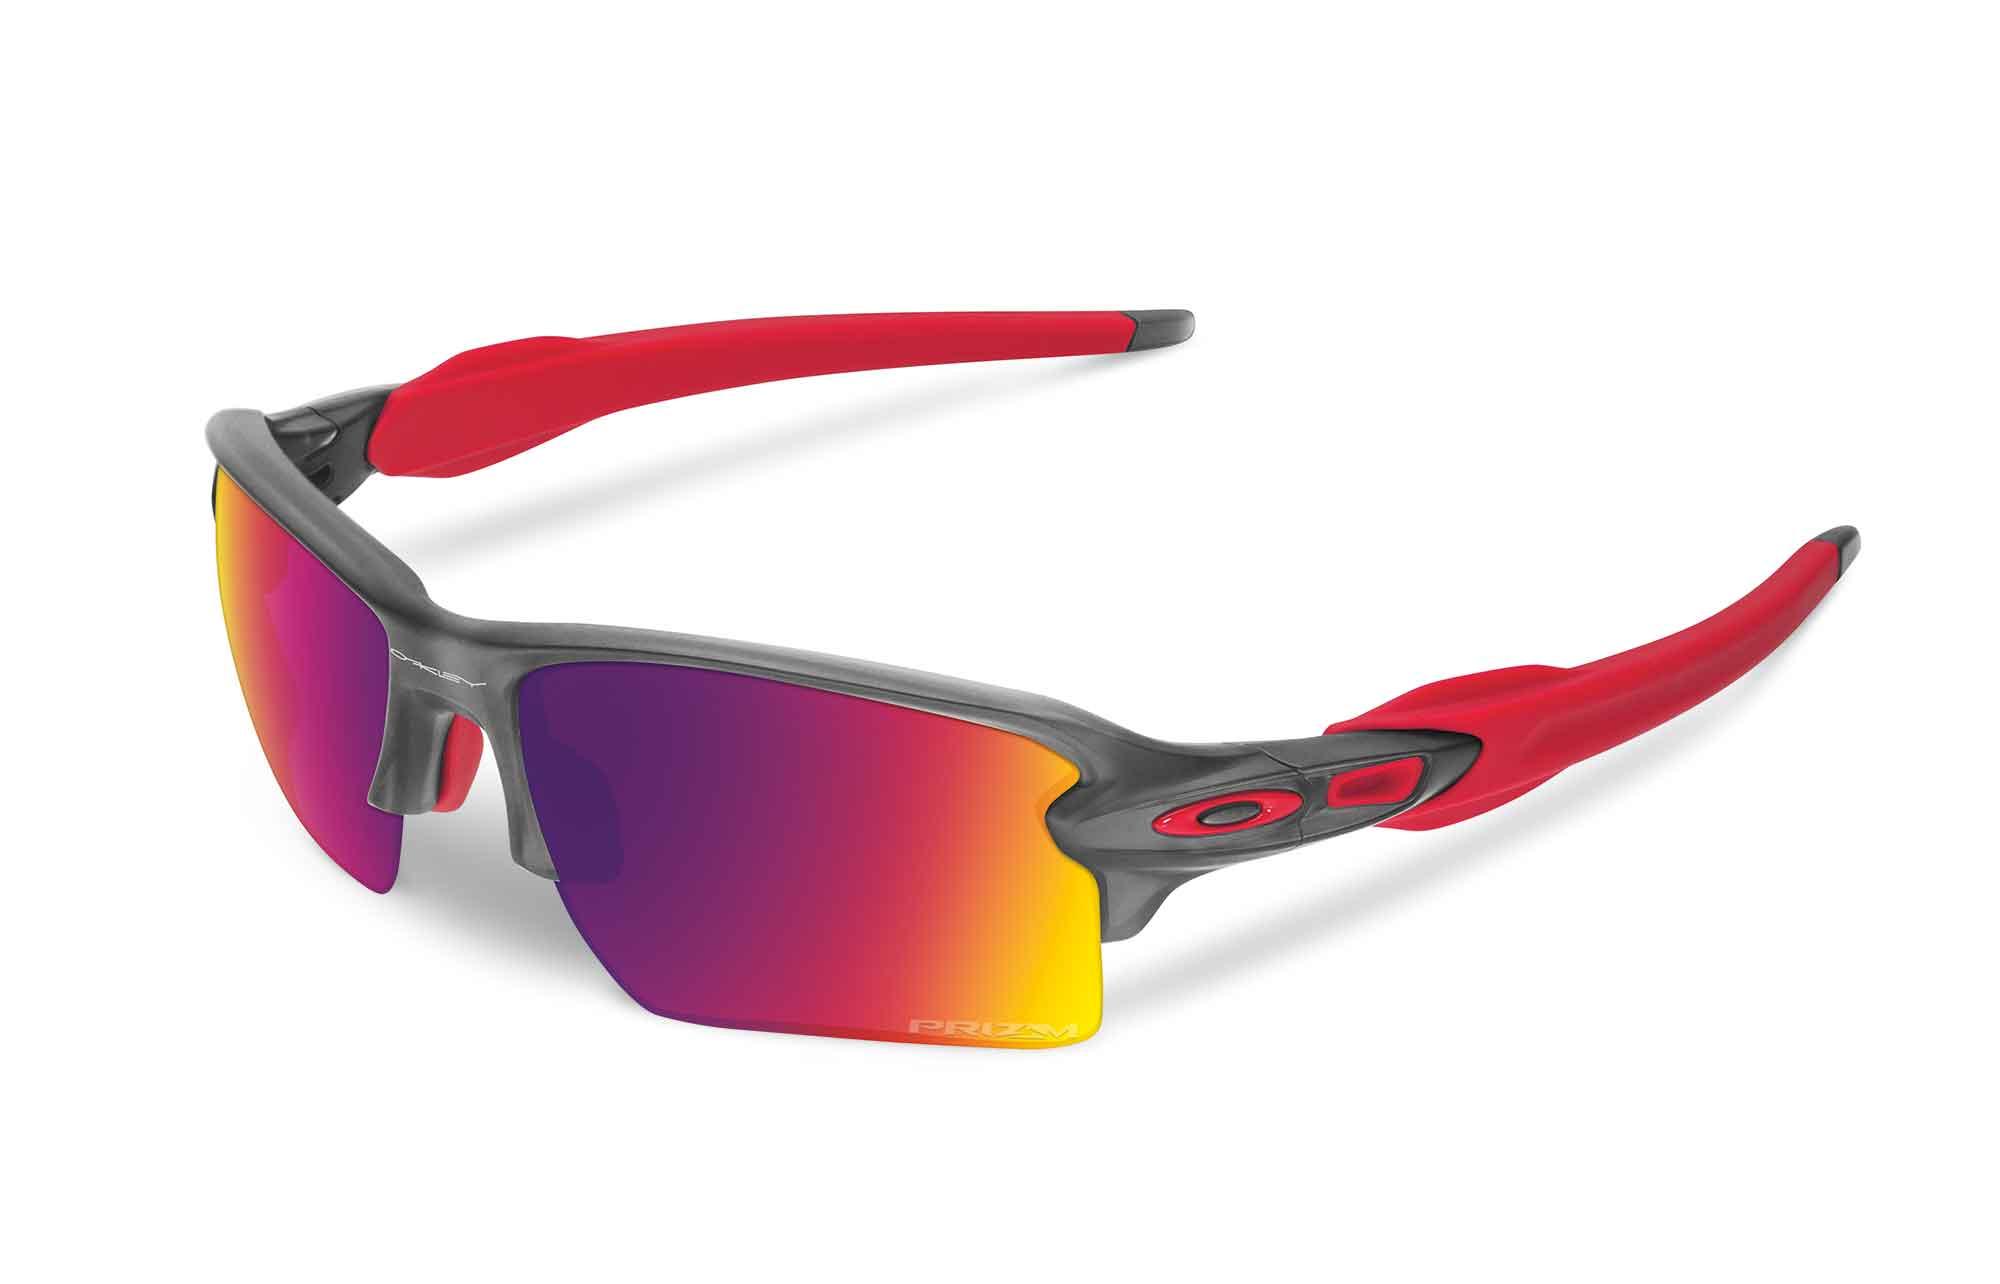 8ae7d1853a Oakley Prizm Road Flak Jacket 2.0 XL Glasses